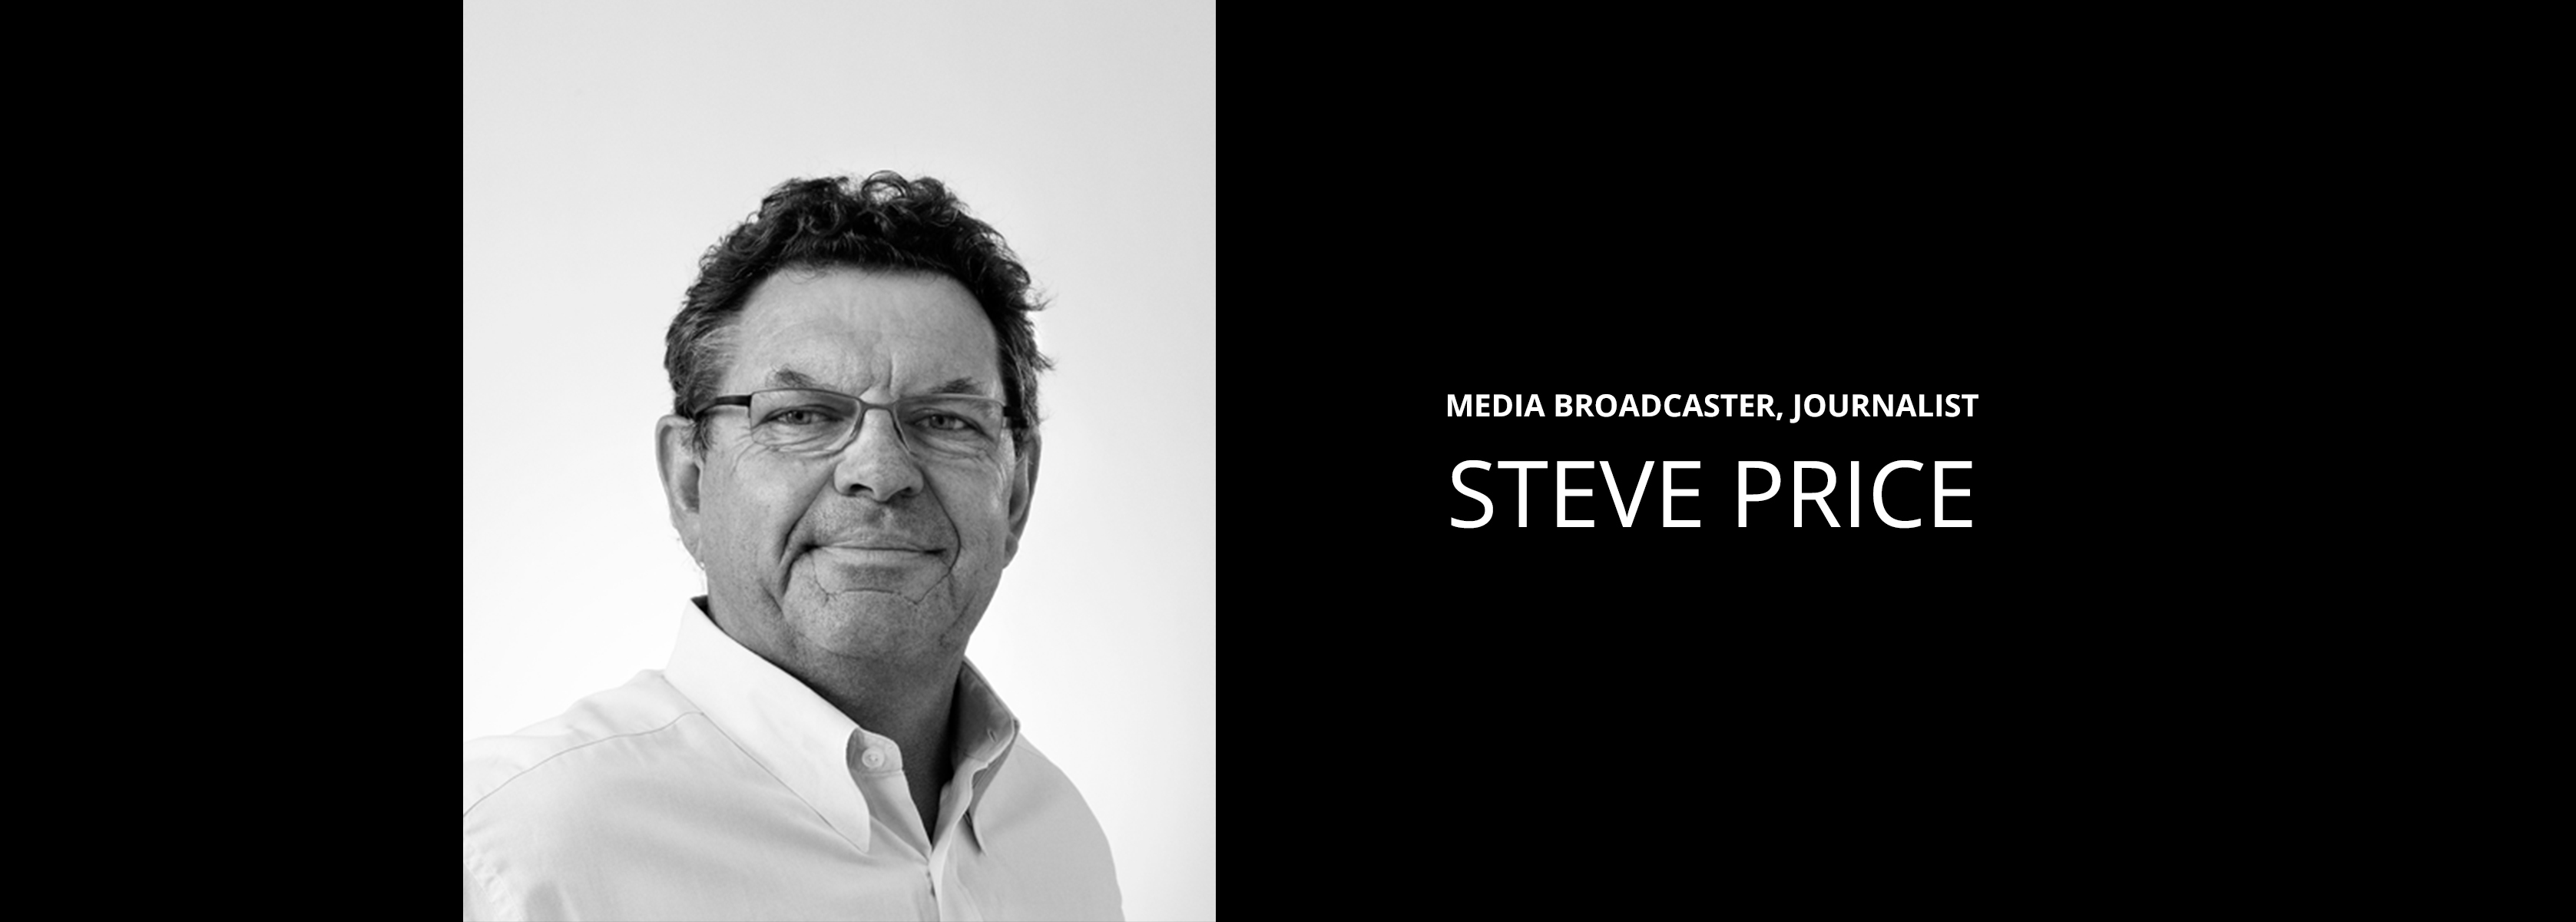 Steve Price - Media Broadcaster, Journalist - Bravo Talent Management